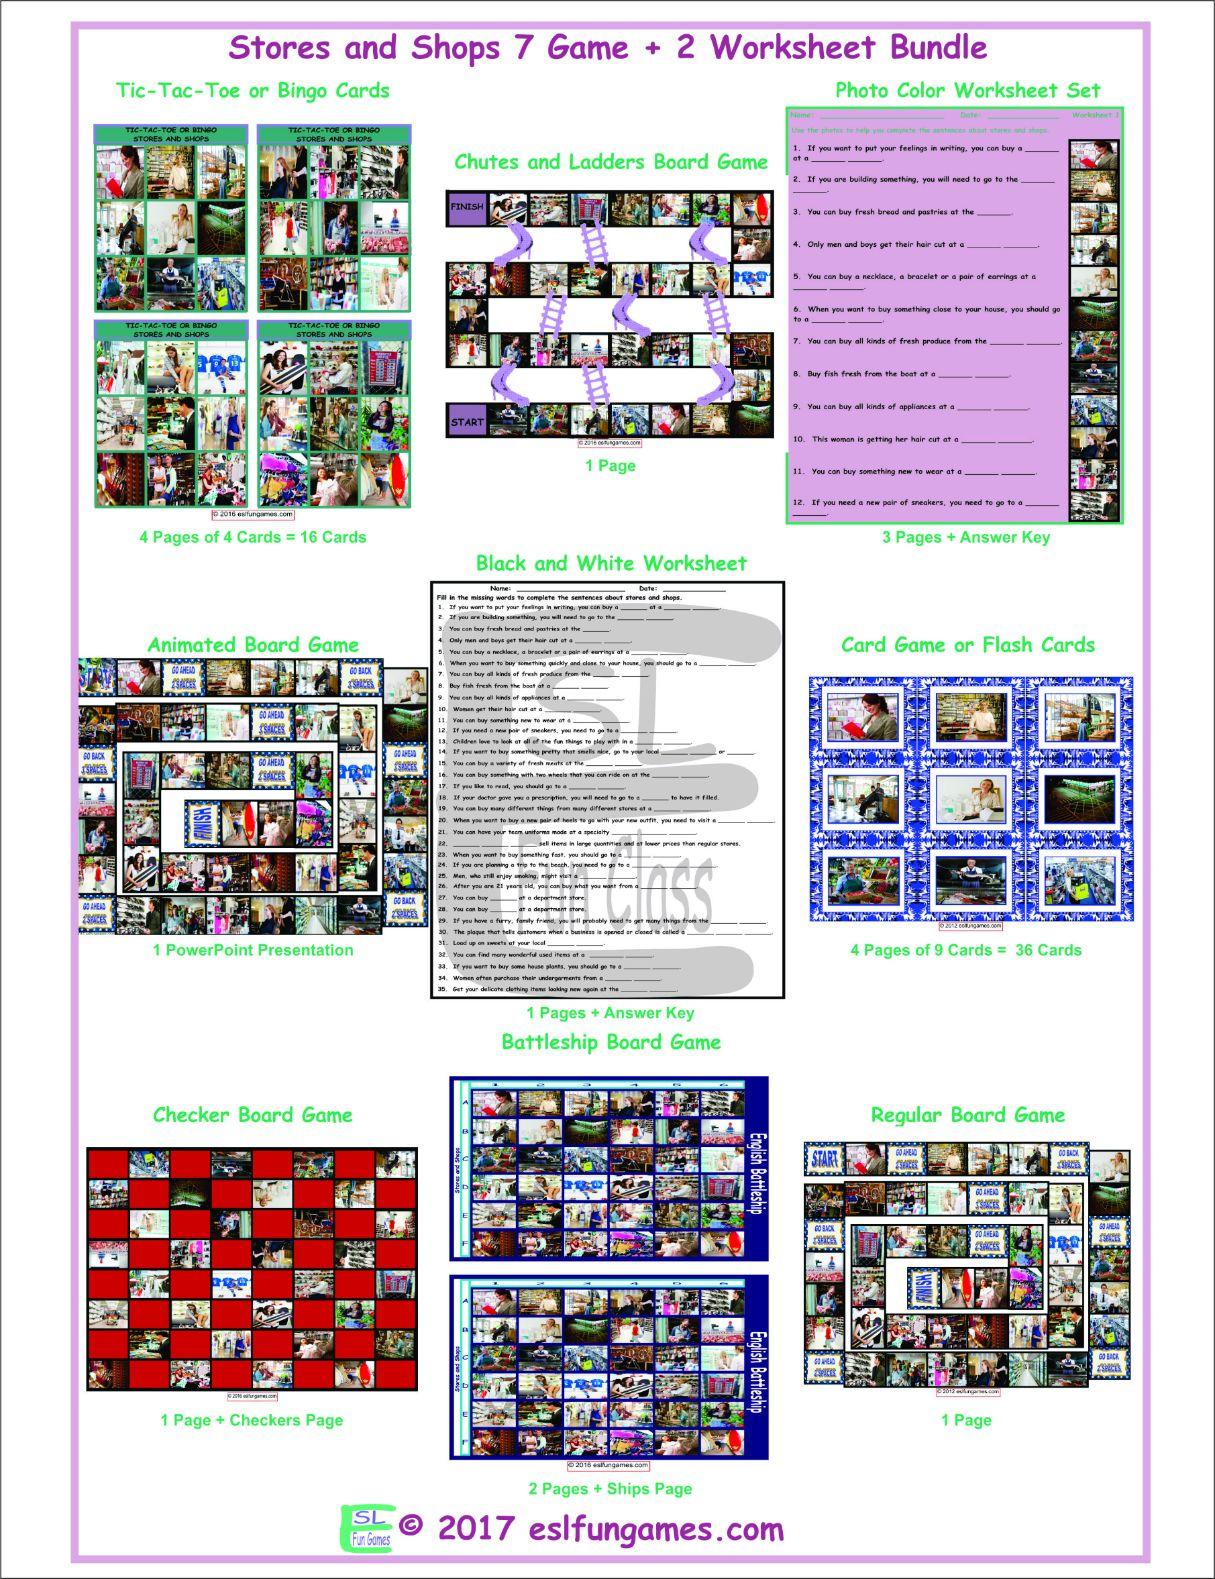 Stores and Shops 7 Game Plus 2 Worksheet Bundle